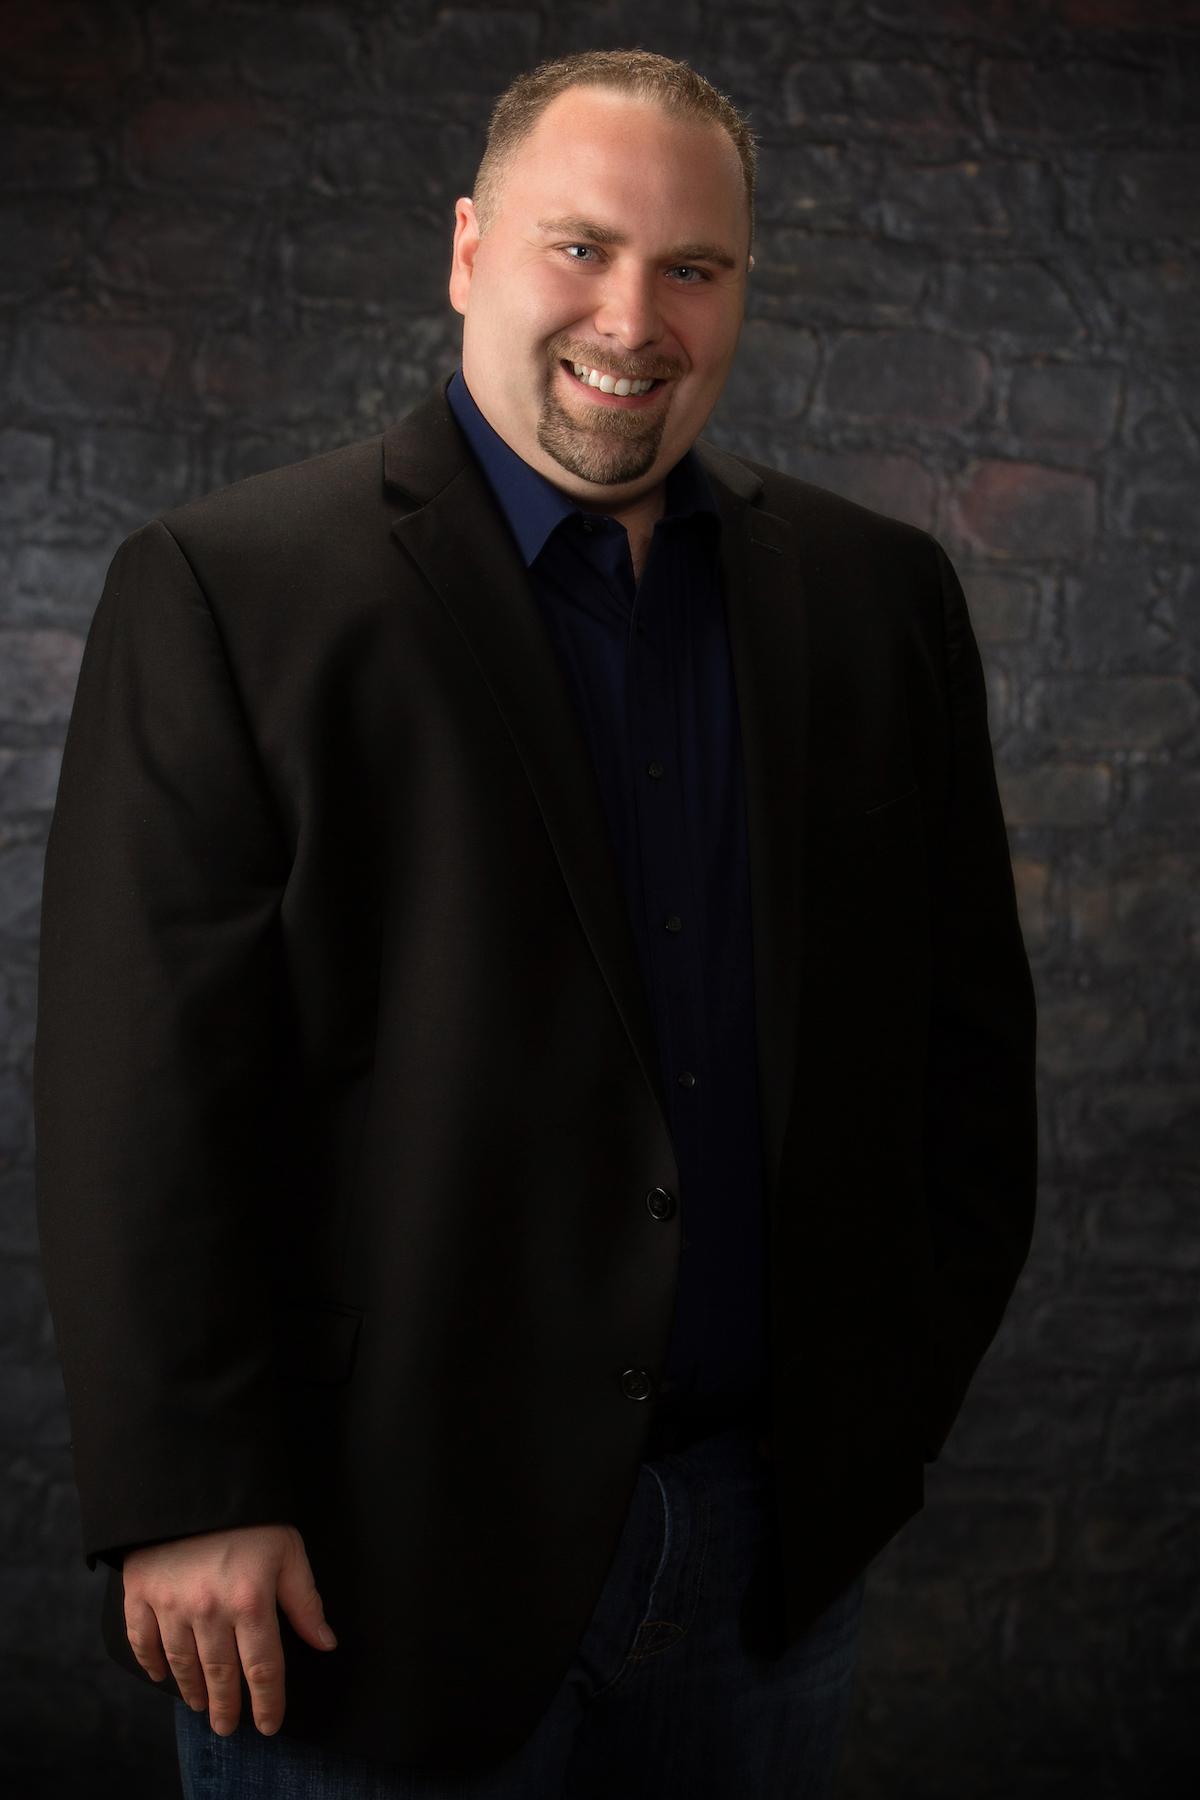 Mike Chirichella